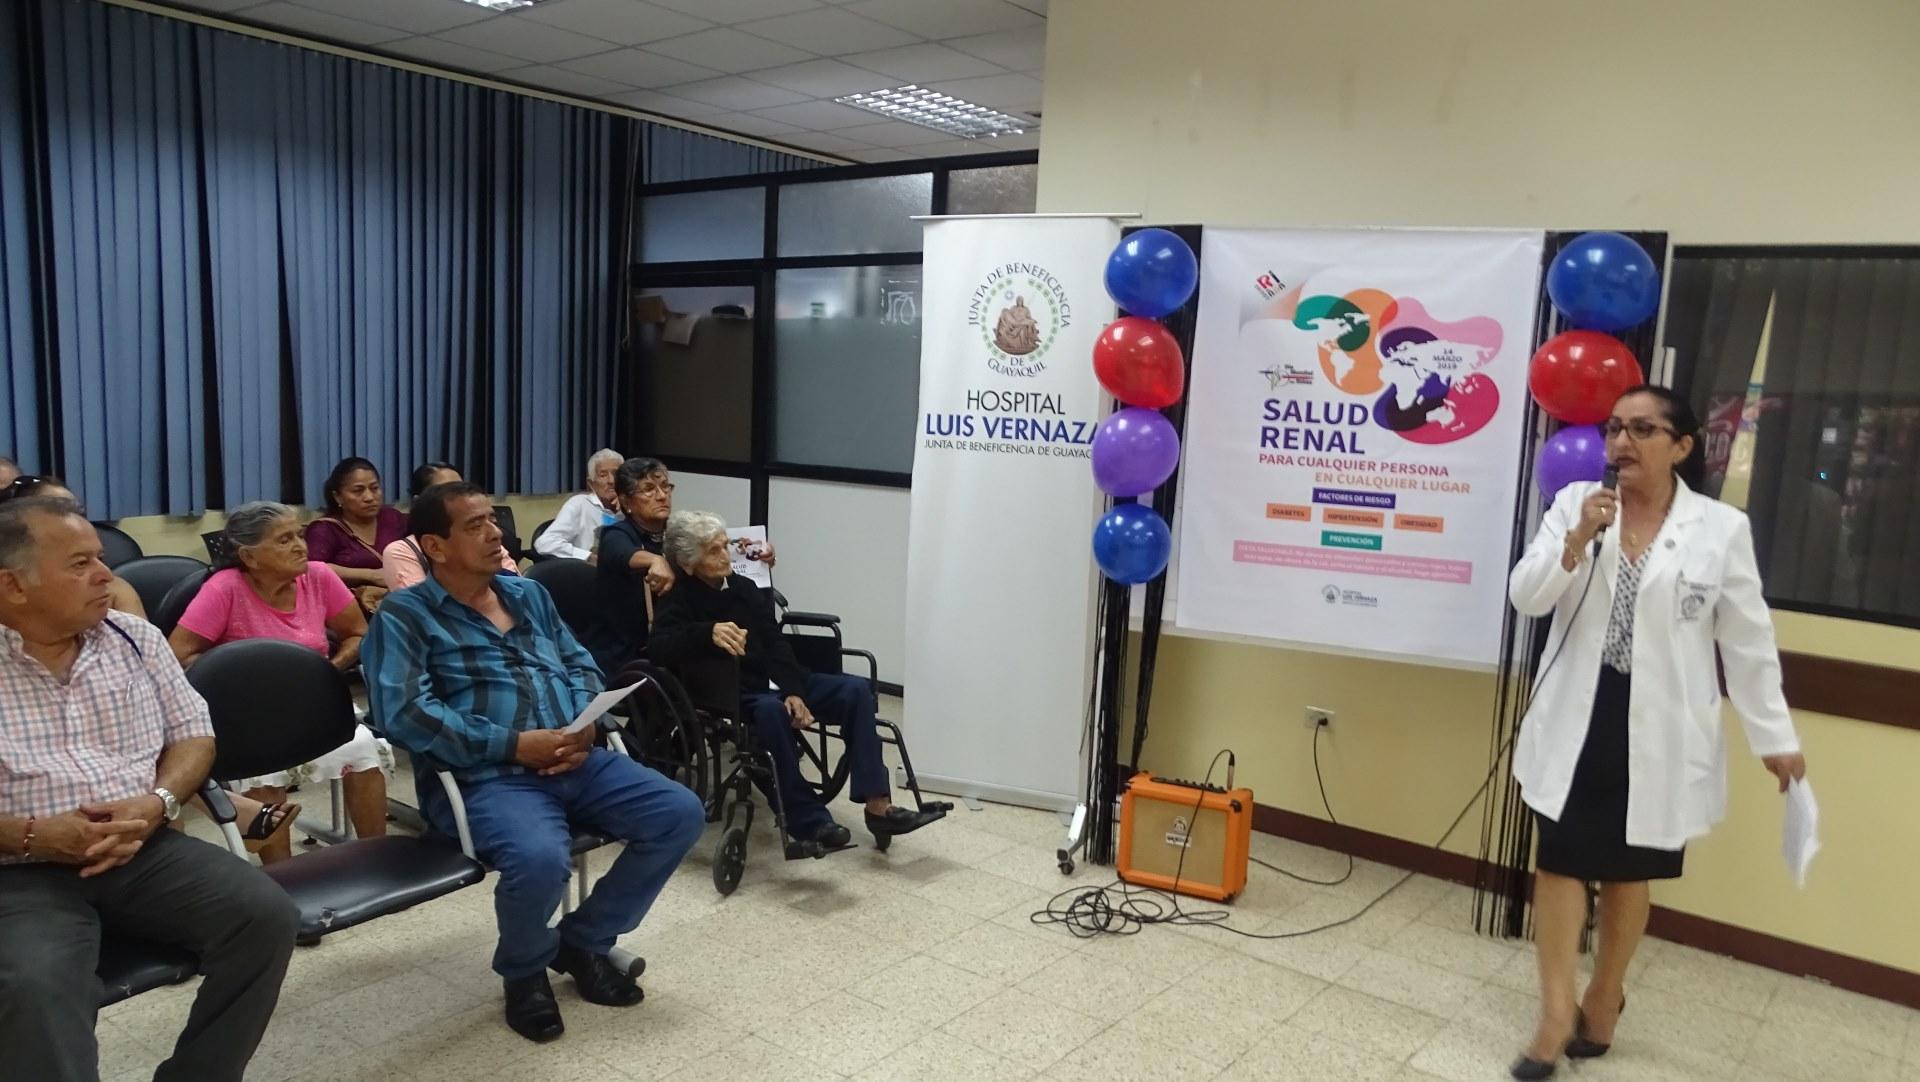 charla renal vernaza 2019